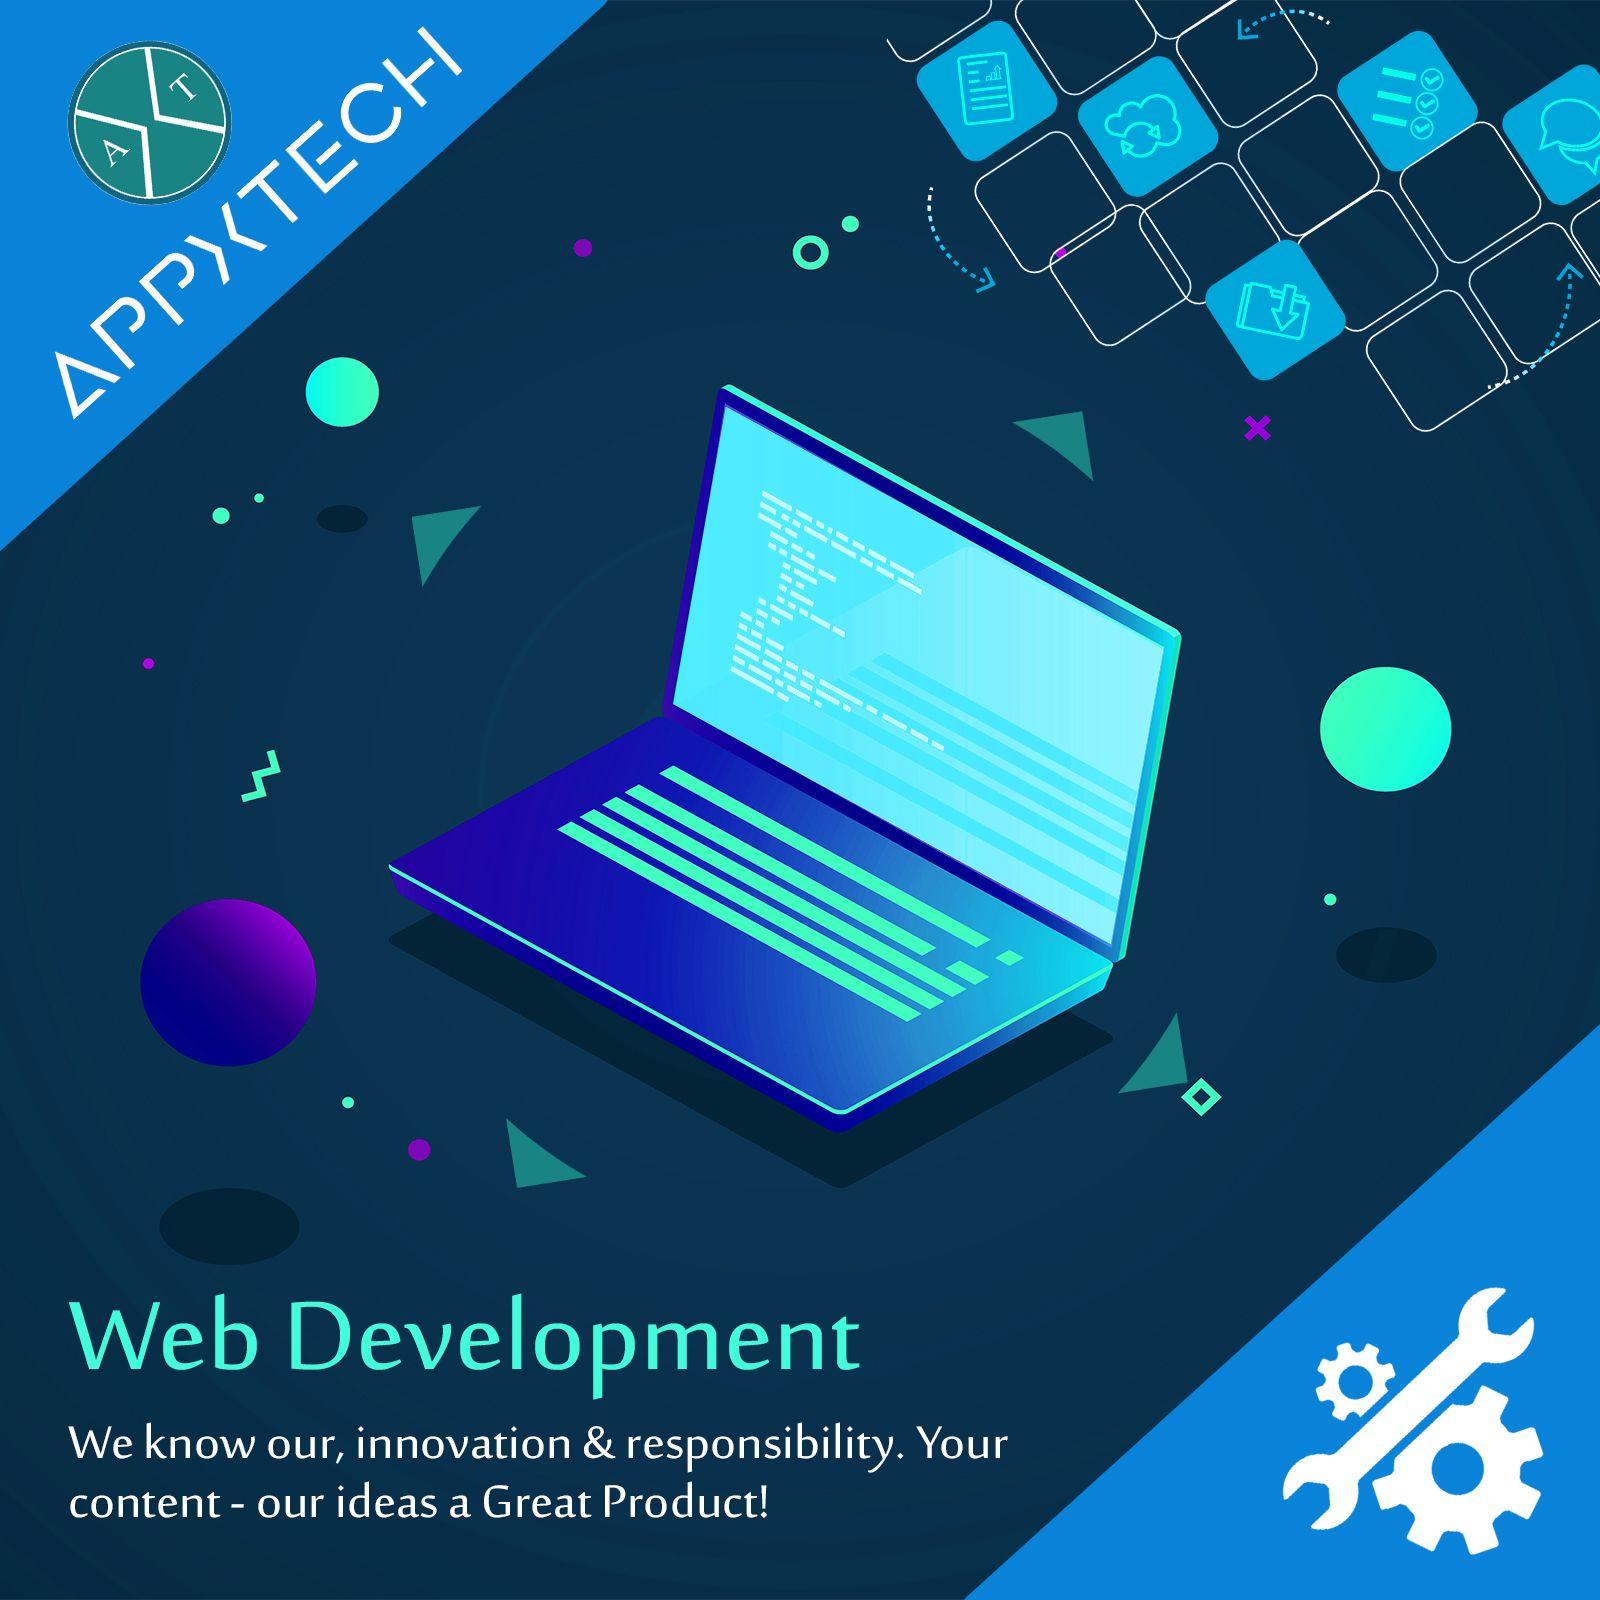 Pin by APPXTECH on Appxtech - Web Development Company | Web